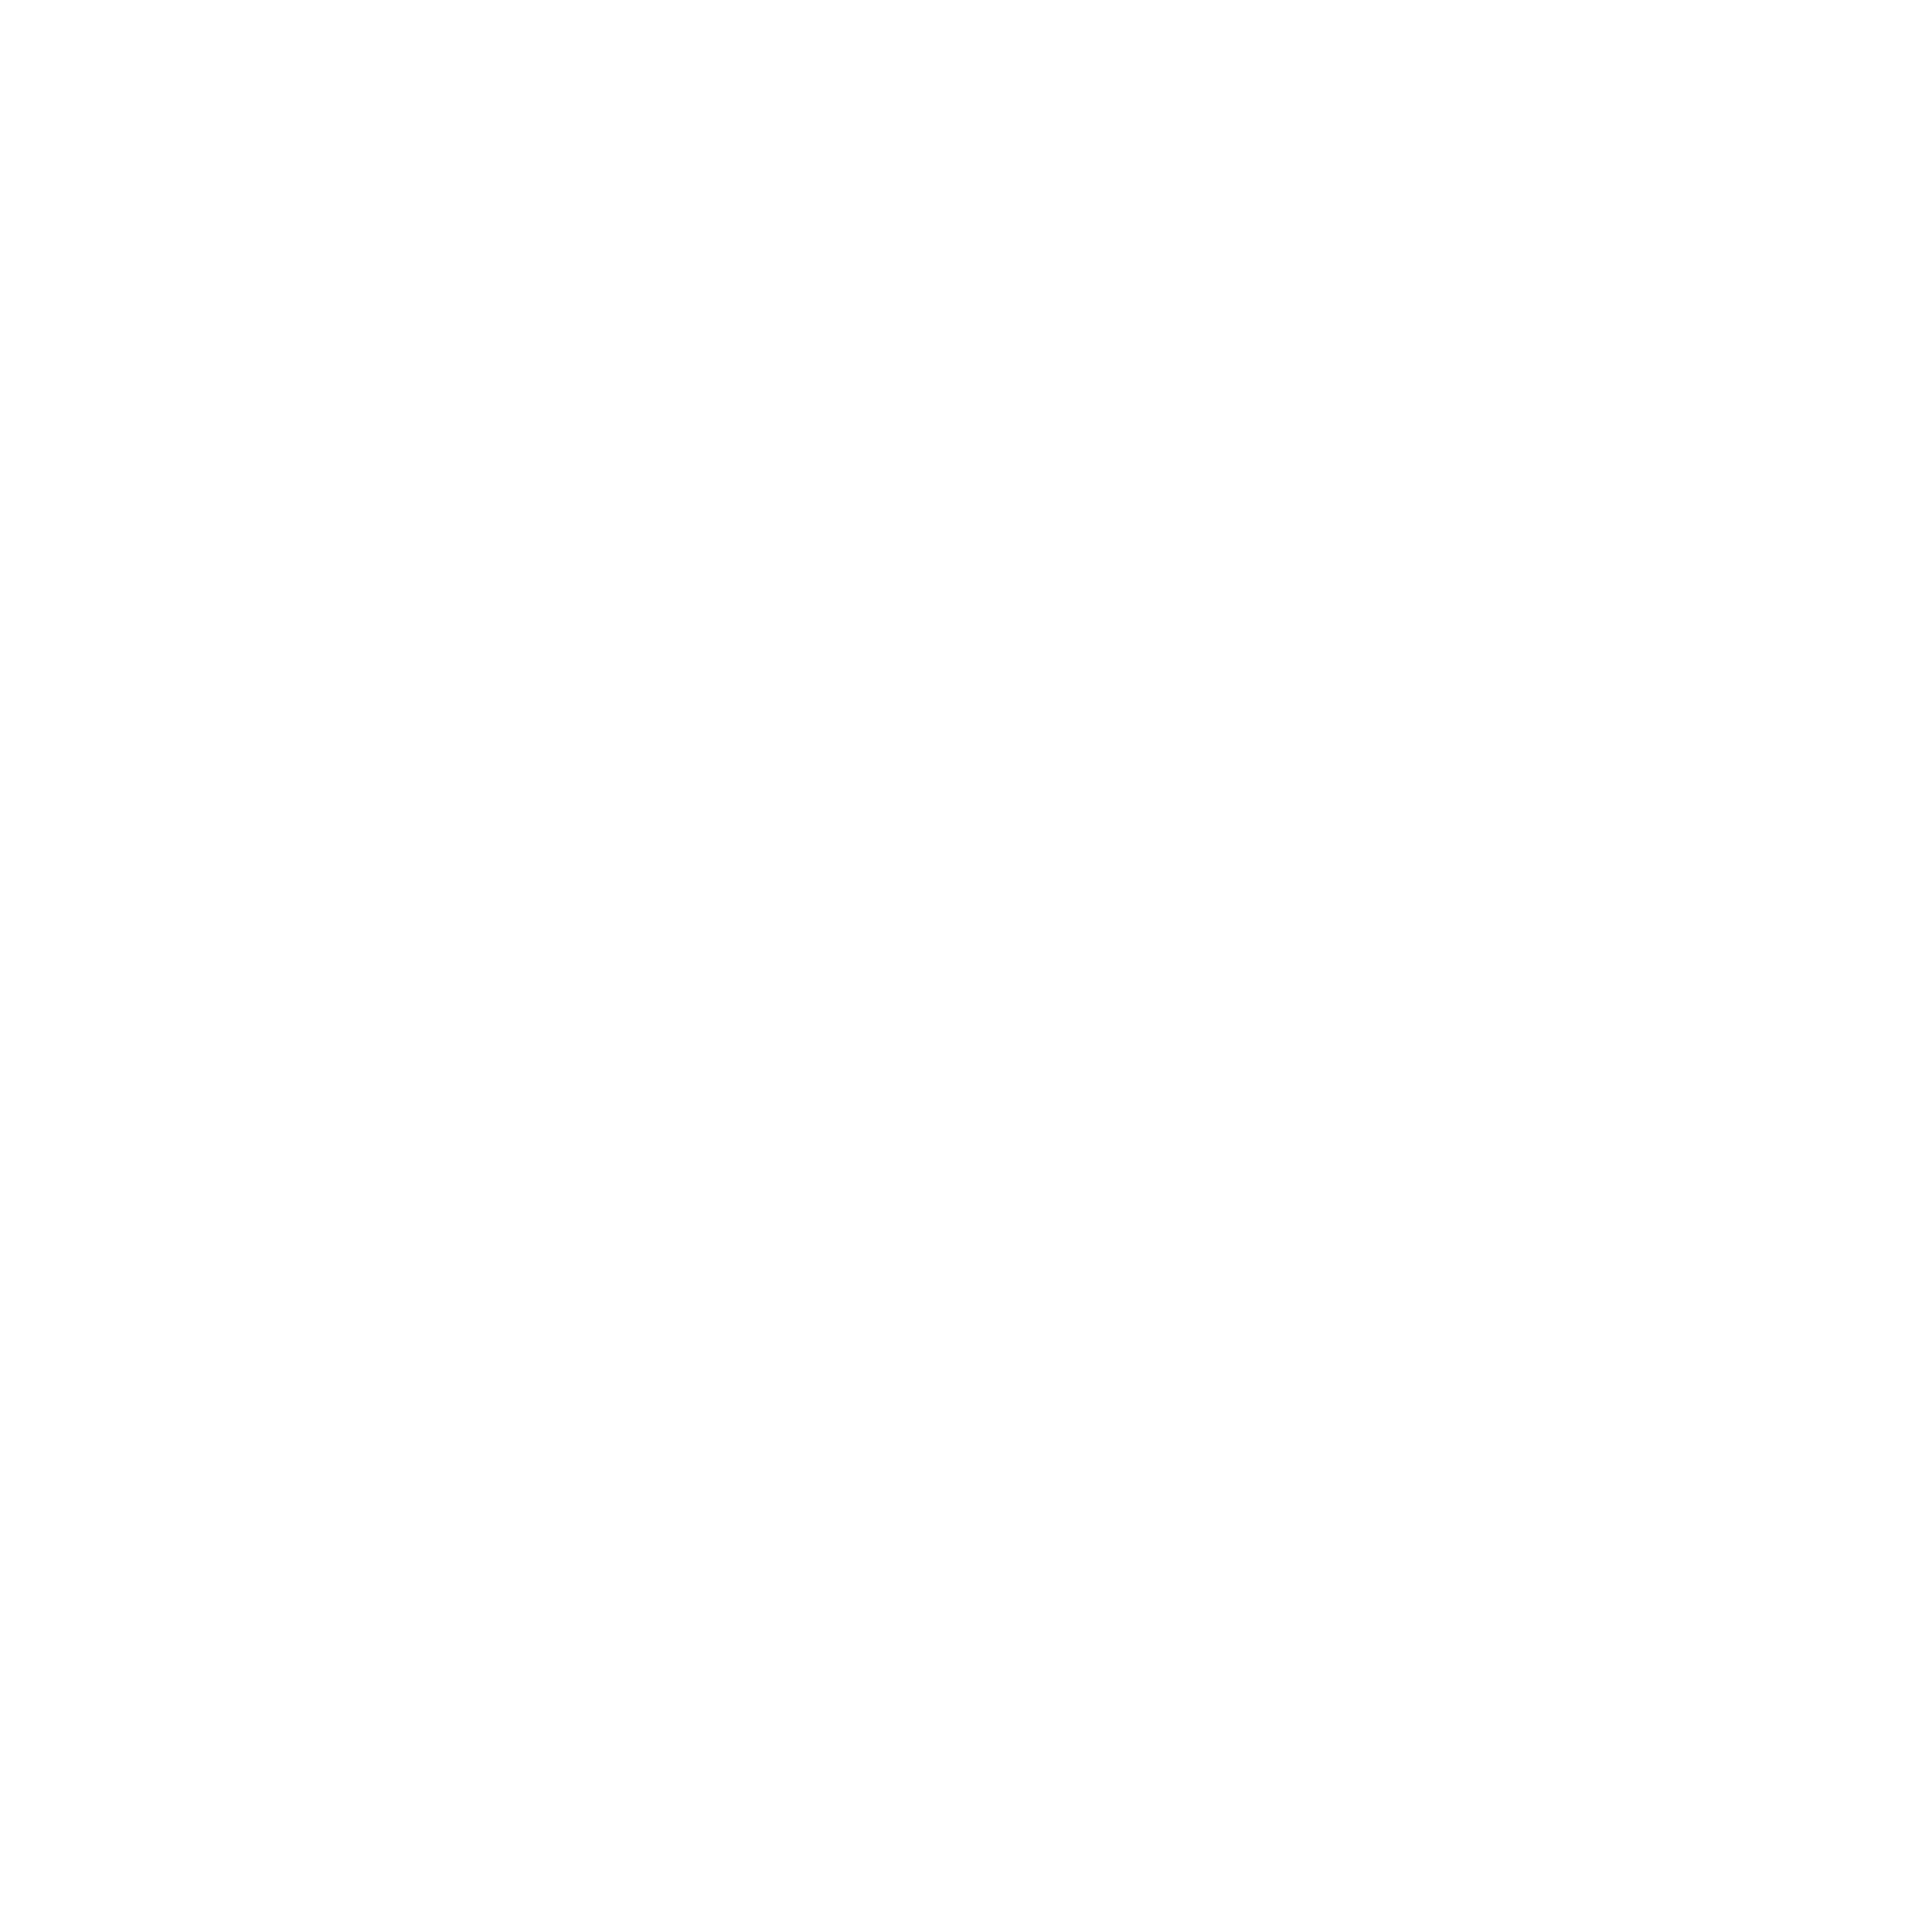 ADP-36FV